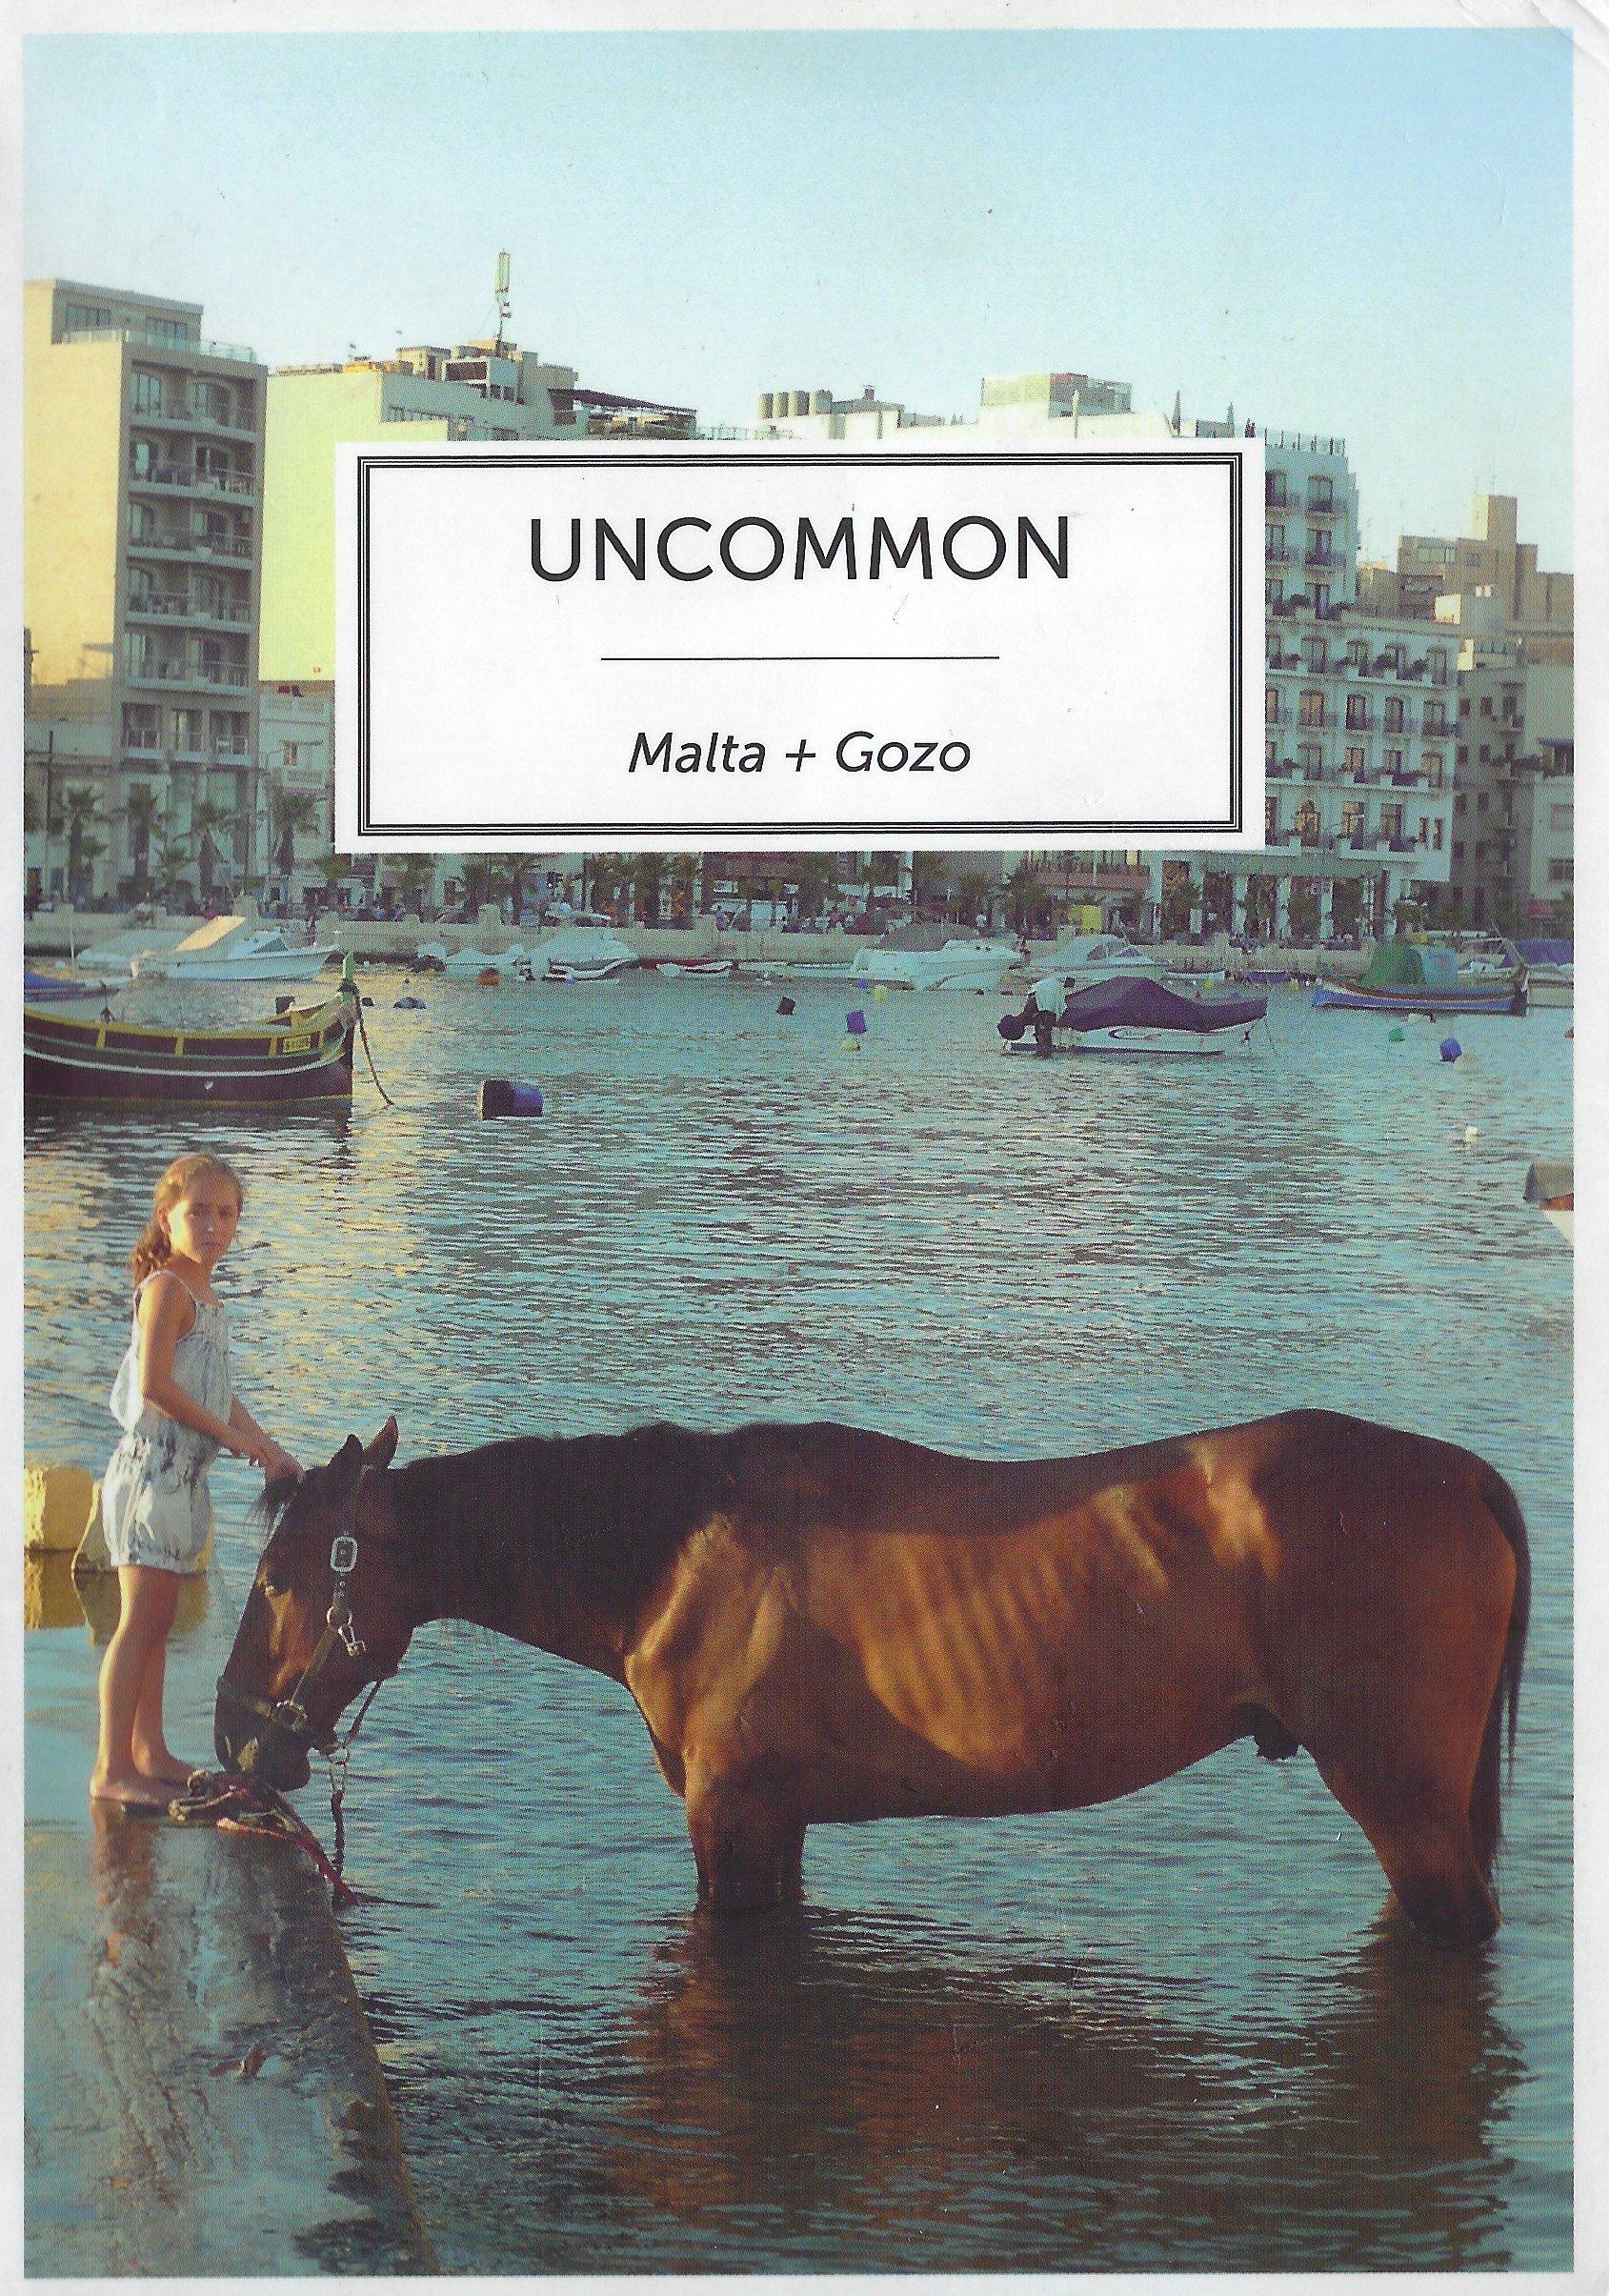 Uncommon Malta and Gozo Hardcover – January 9, 2011 Emma Mattei Jon Banthrope Miranda Publishers 9990985502